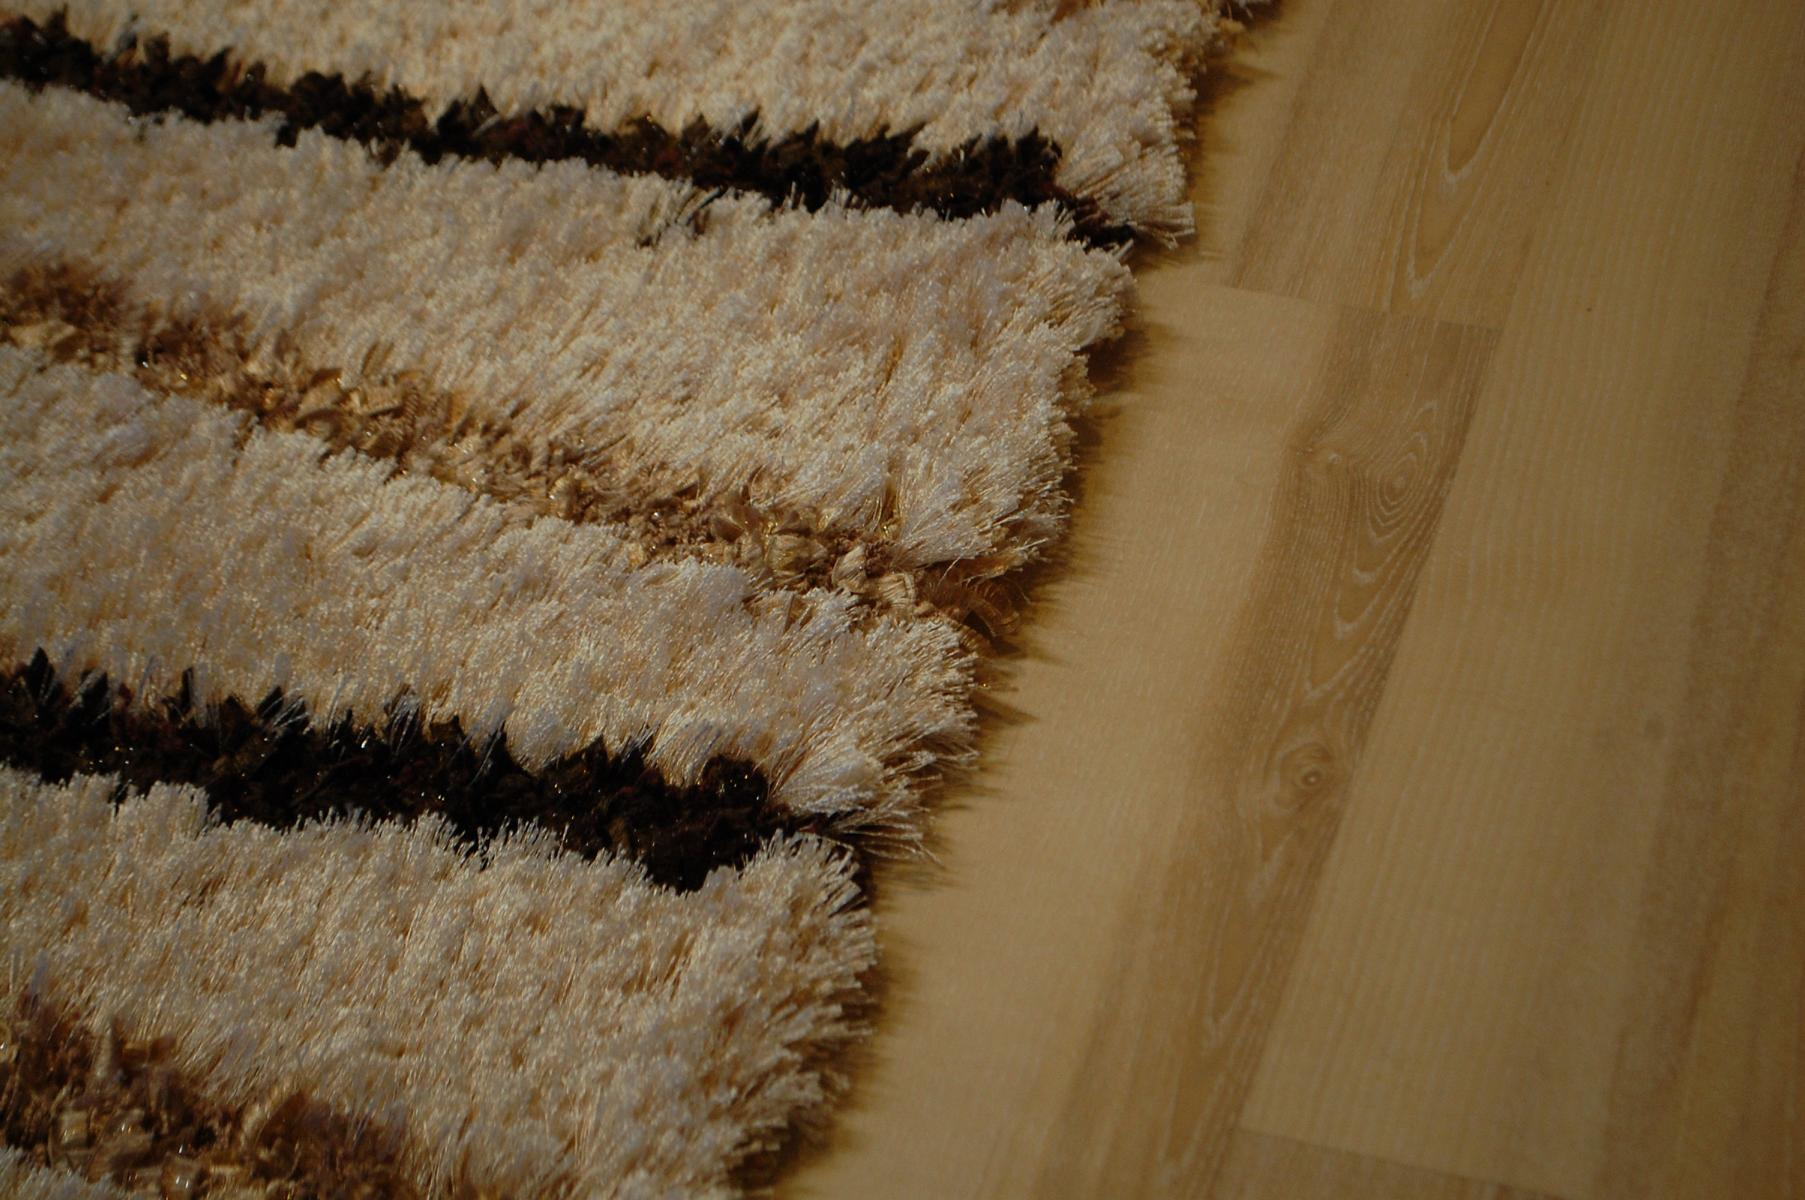 tapis poil long ambato shaggy marron beige ray 120x170cm ebay. Black Bedroom Furniture Sets. Home Design Ideas